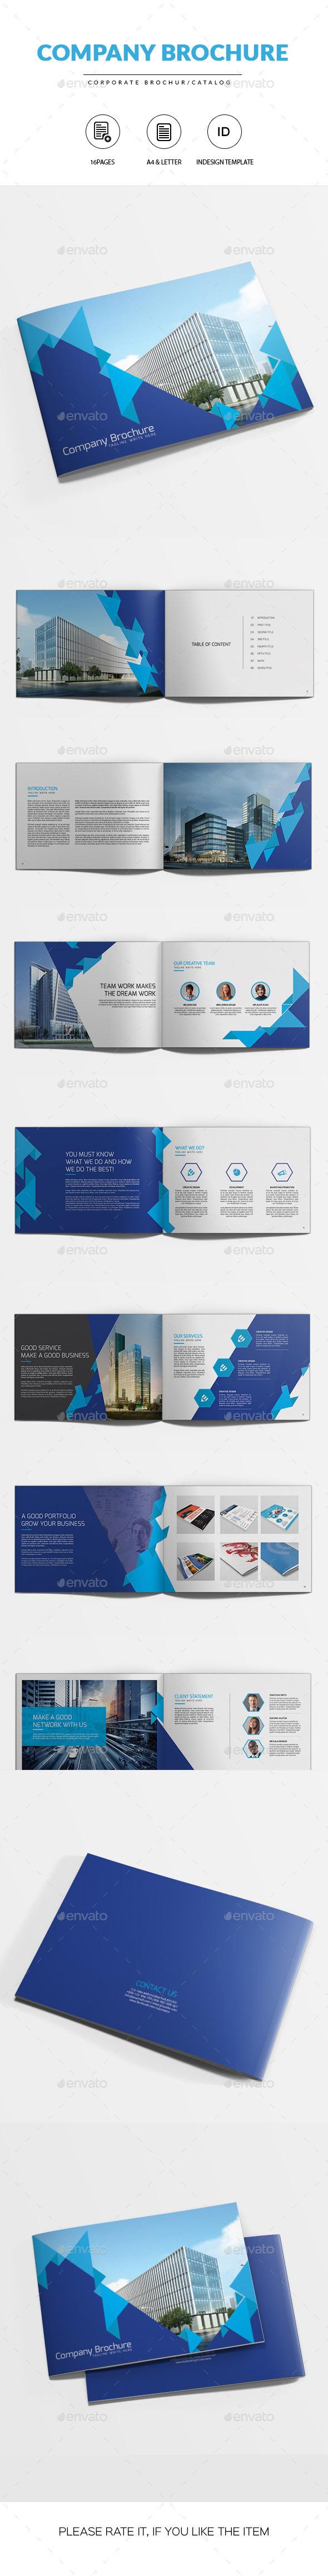 Company Brochure | Indesign Template - Corporate Brochures